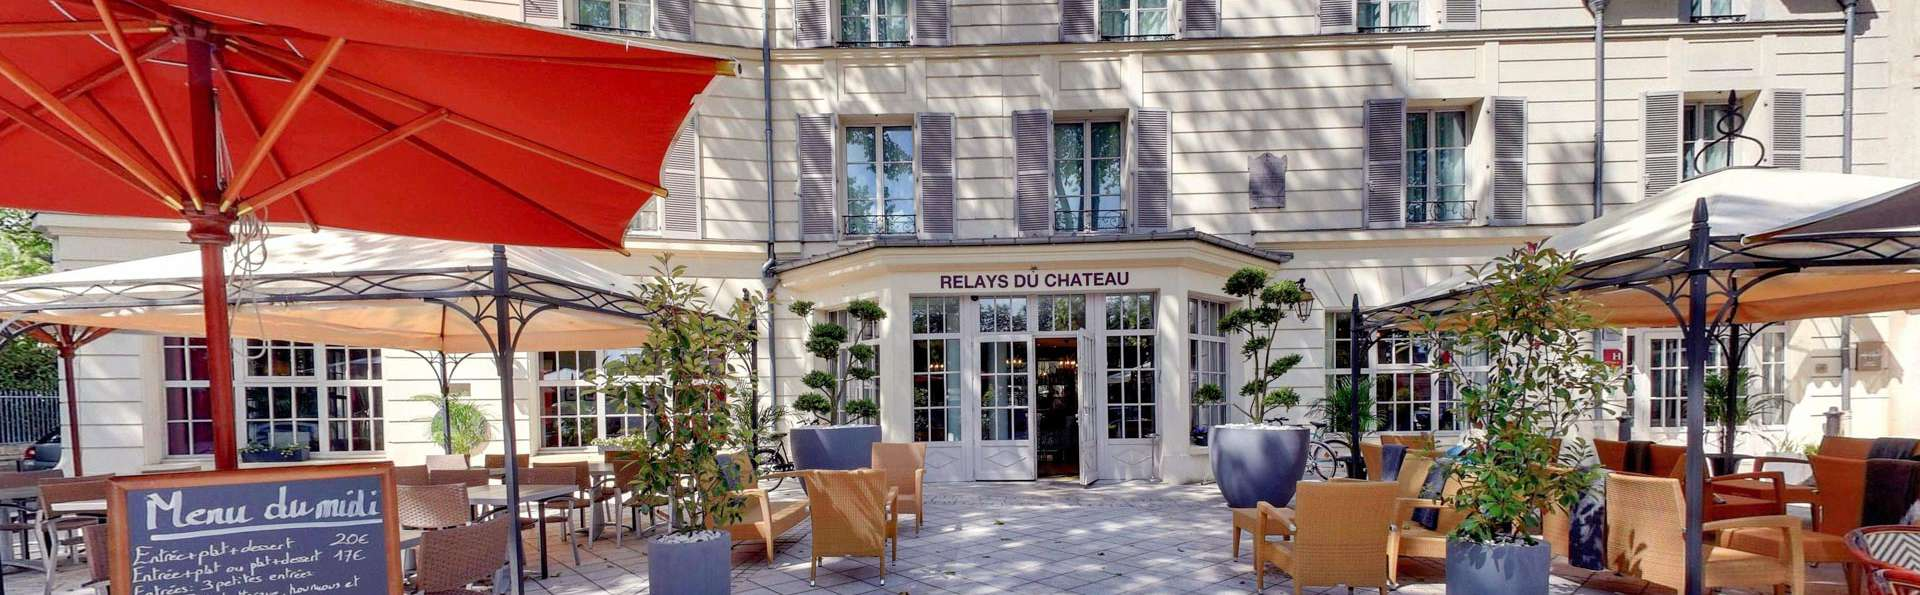 Mercure Relays du Château Rambouillet - EDIT_NEW_TERRACE_02.jpg